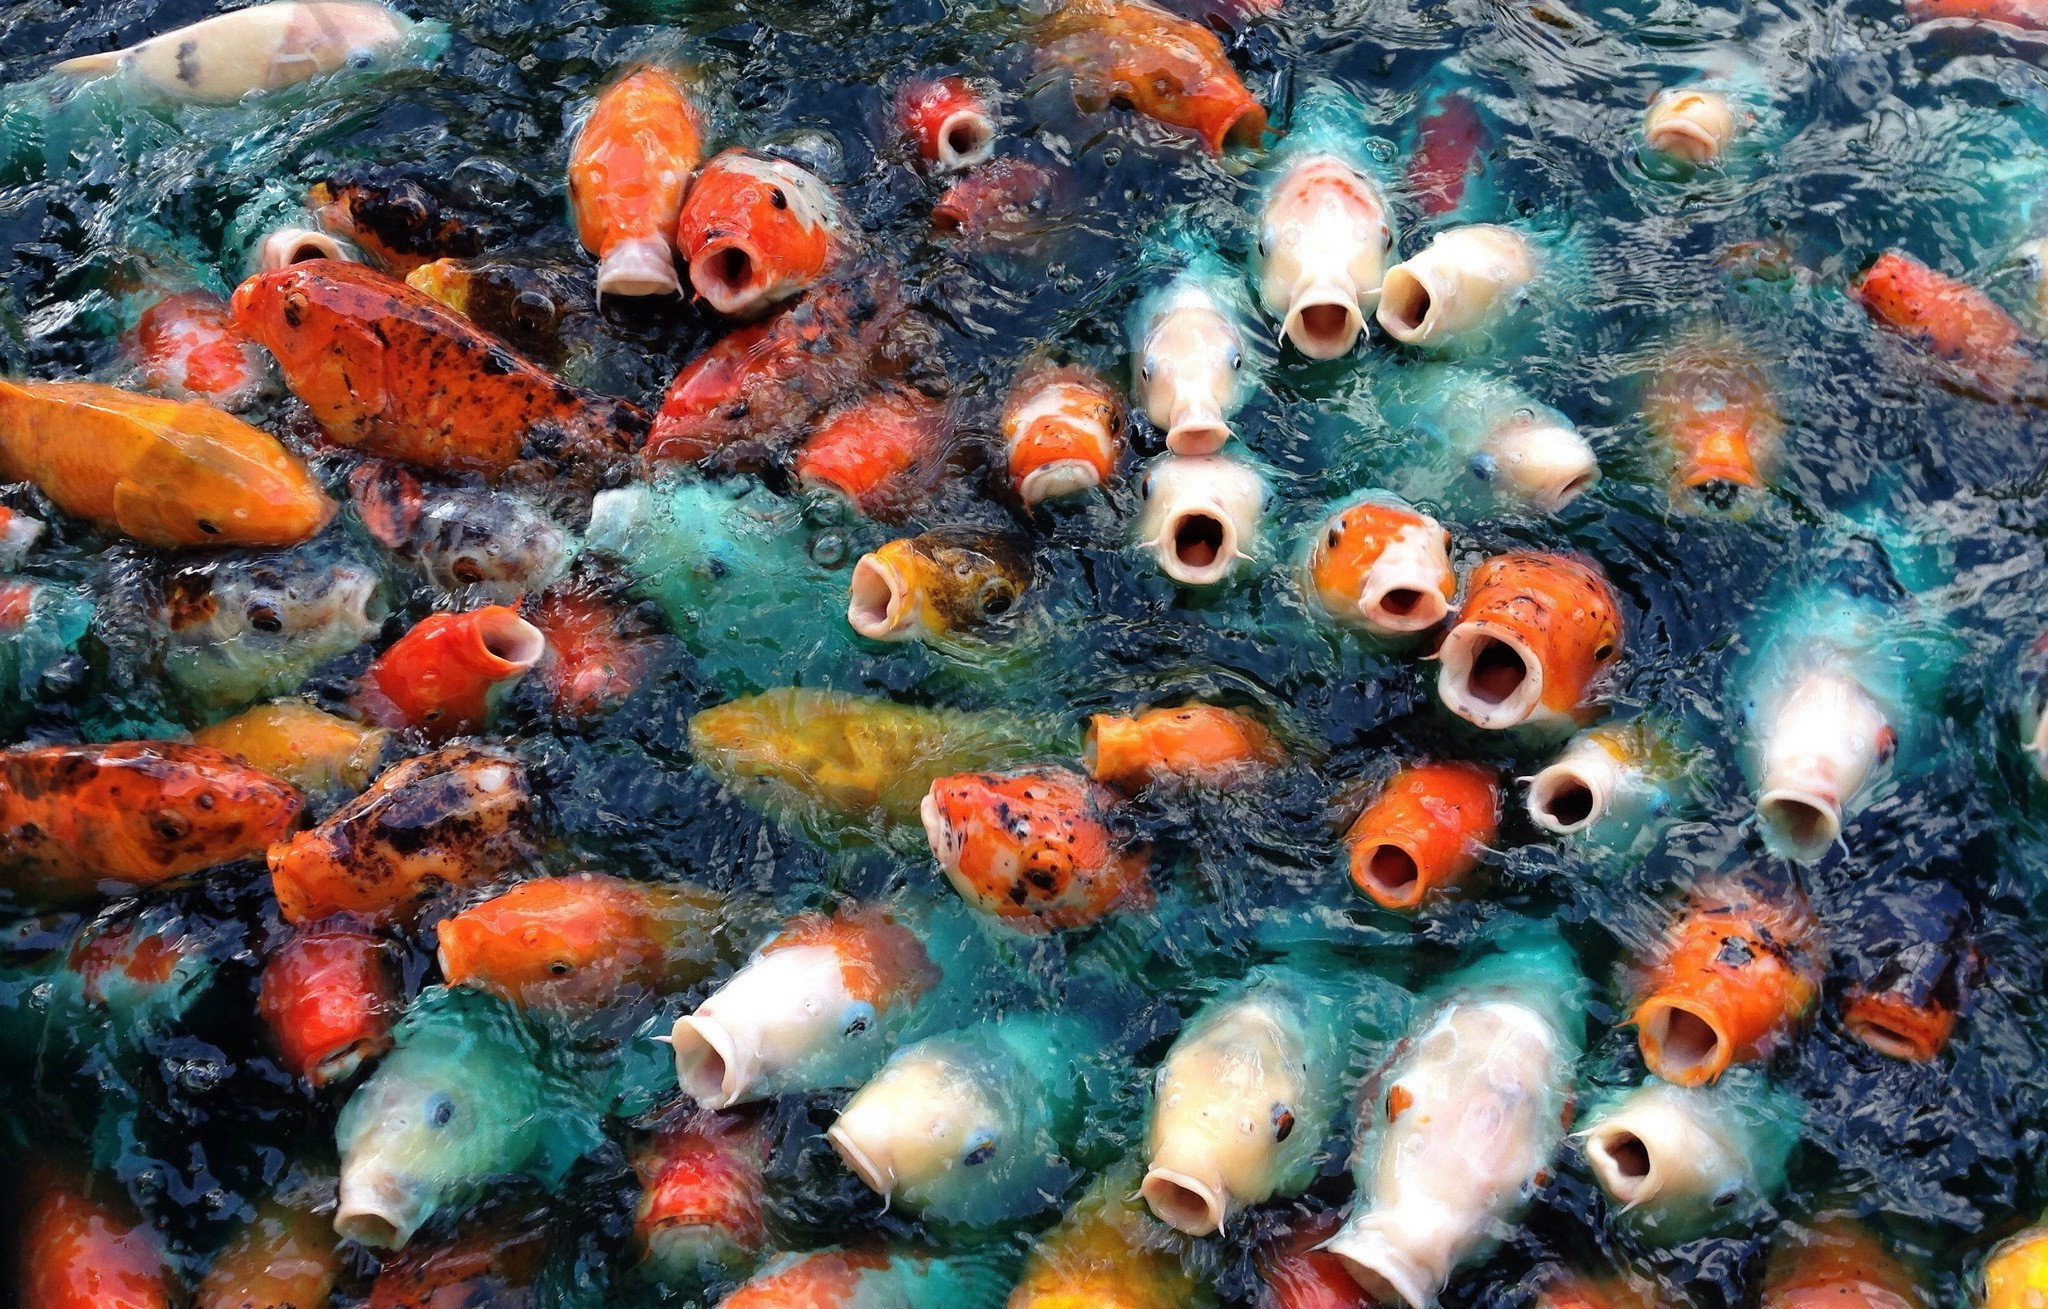 Koi fish background wallpapertag - Carp wallpaper iphone ...